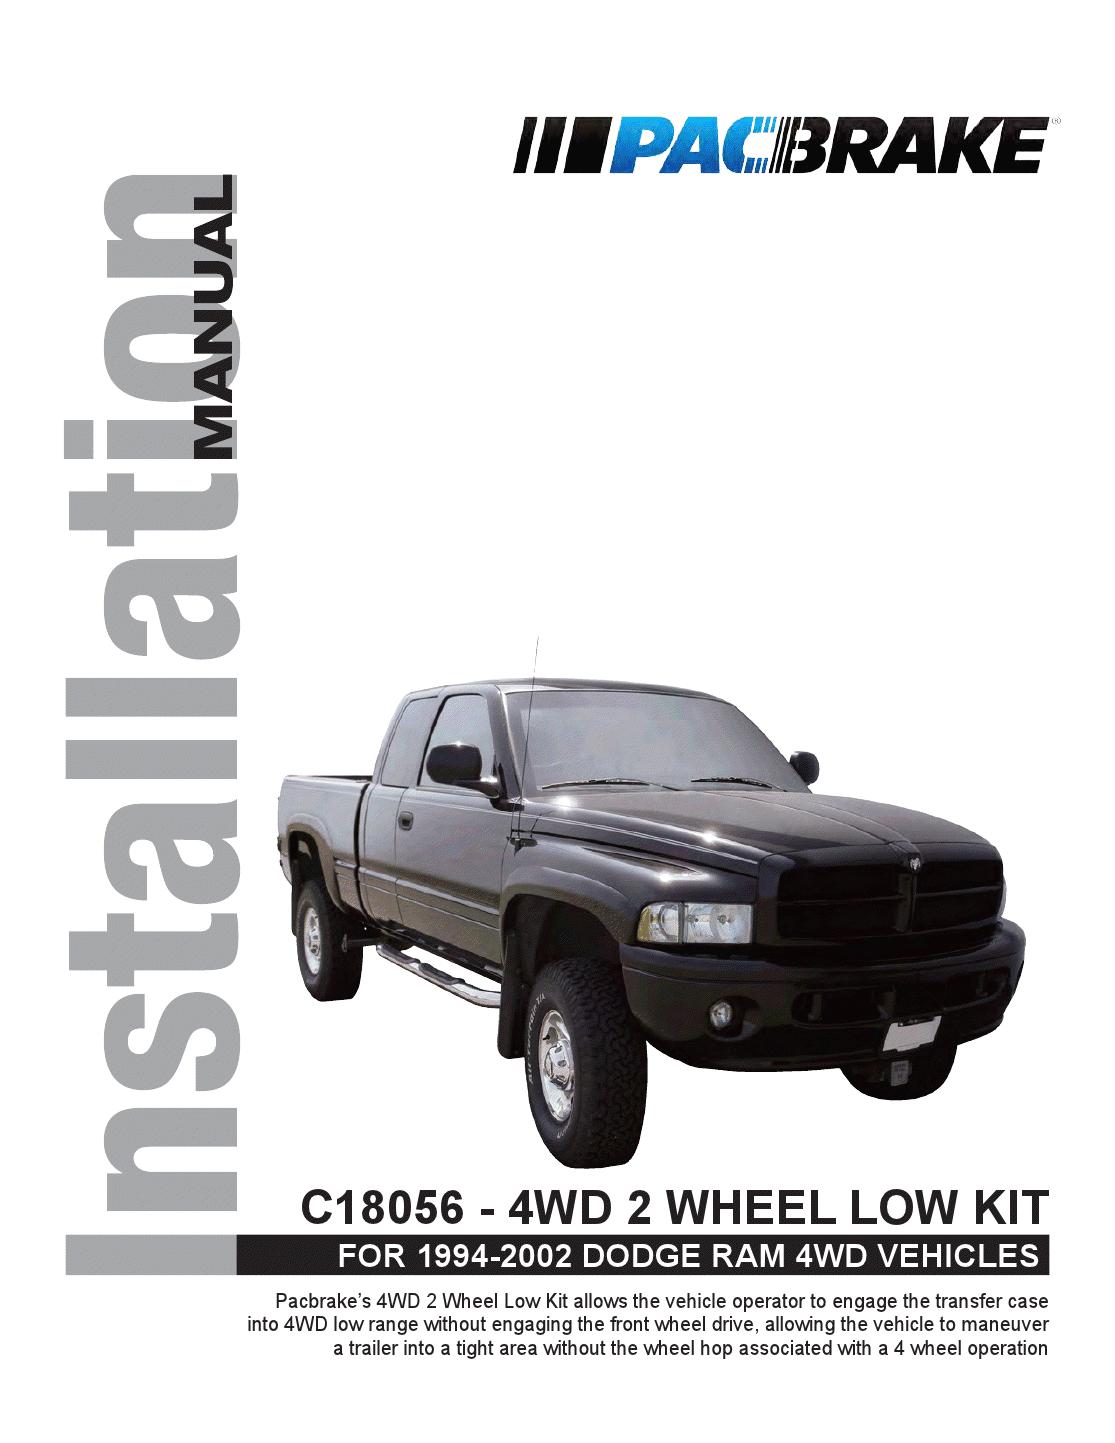 1994-2002 DODGE RAM 4WD VEHICLES